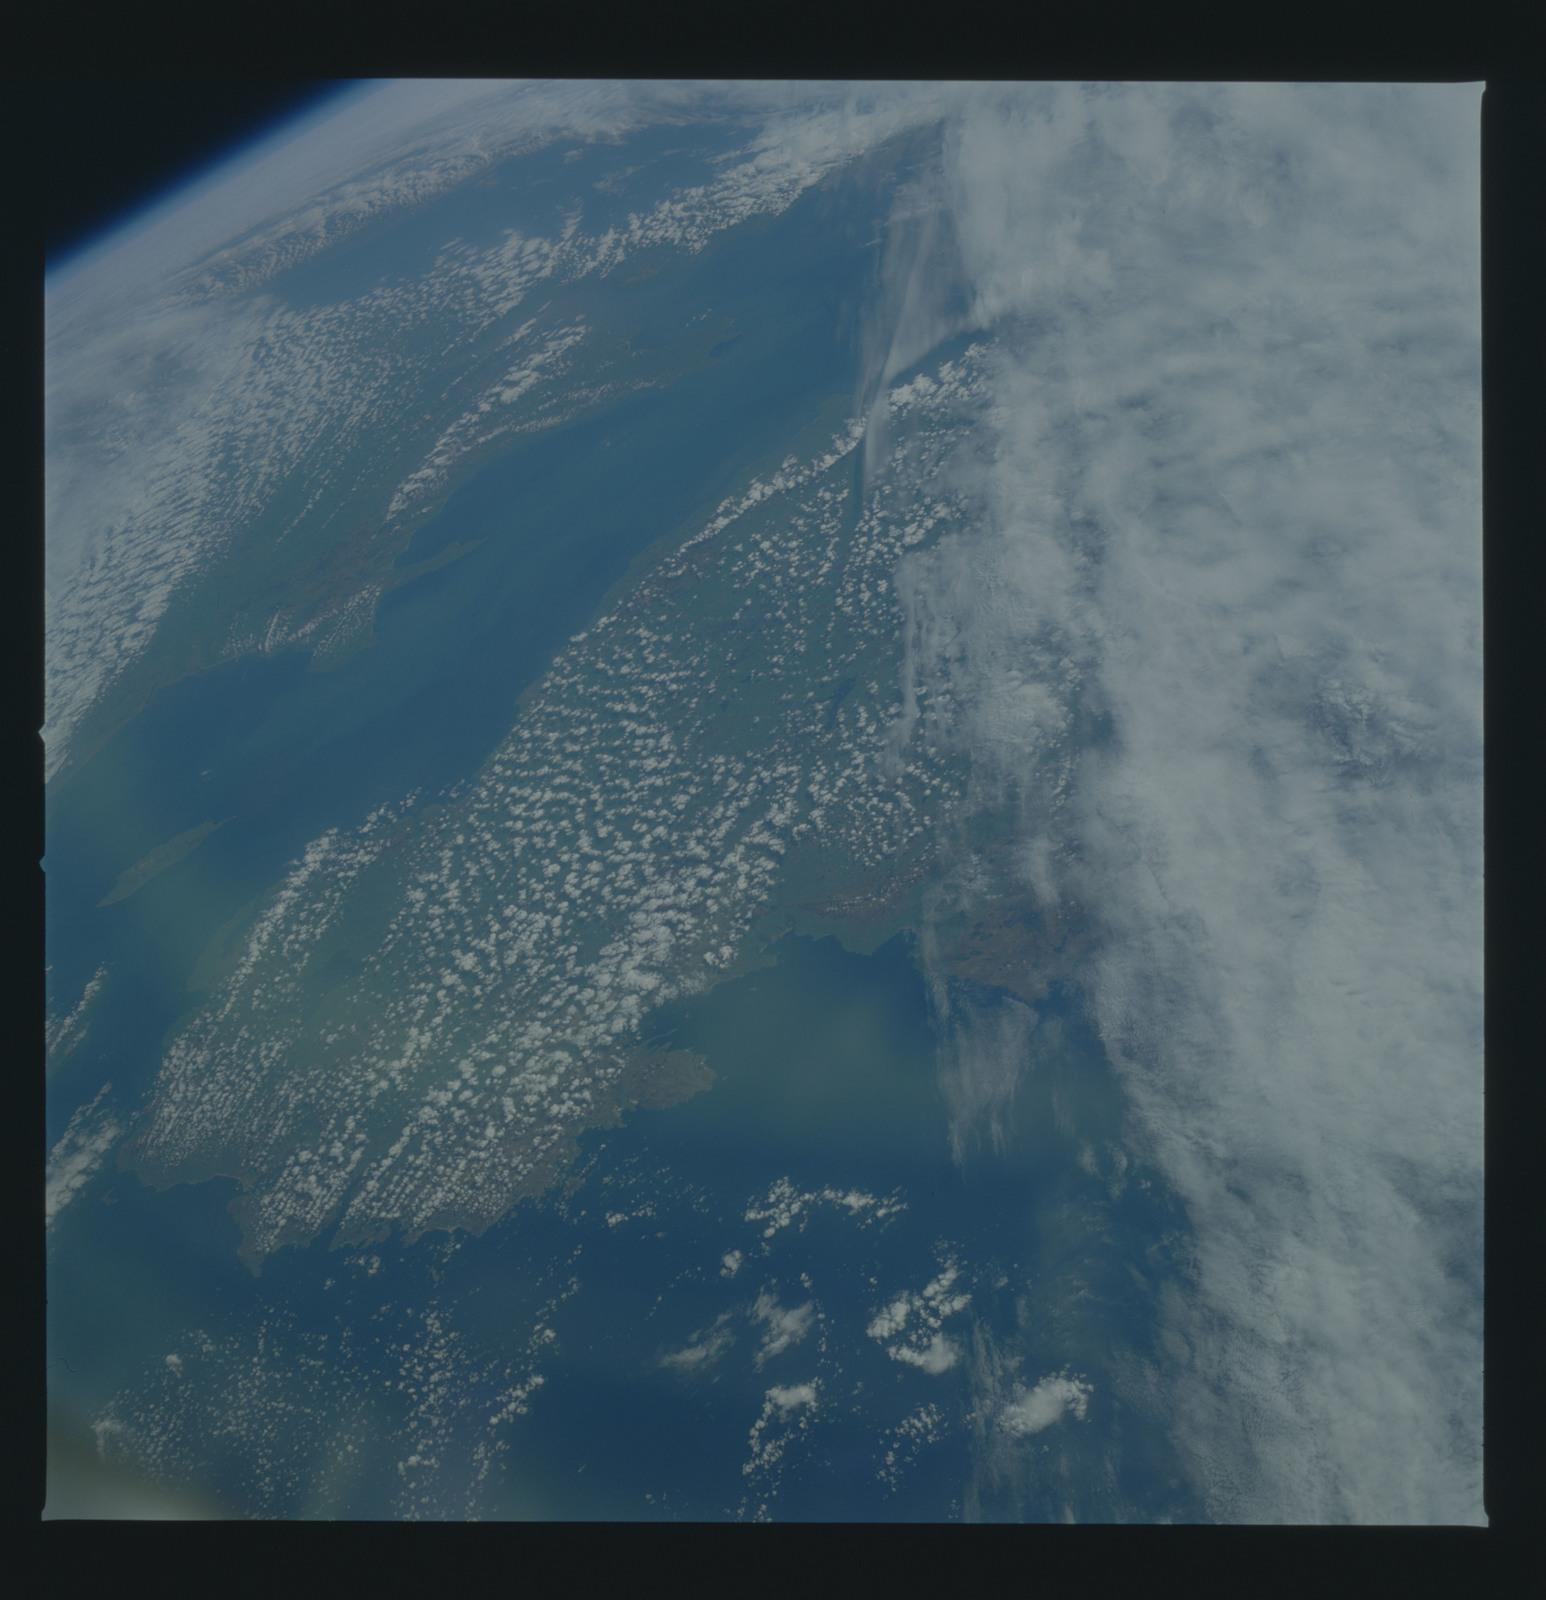 51B-37-056 - STS-51B - 51B earth observation